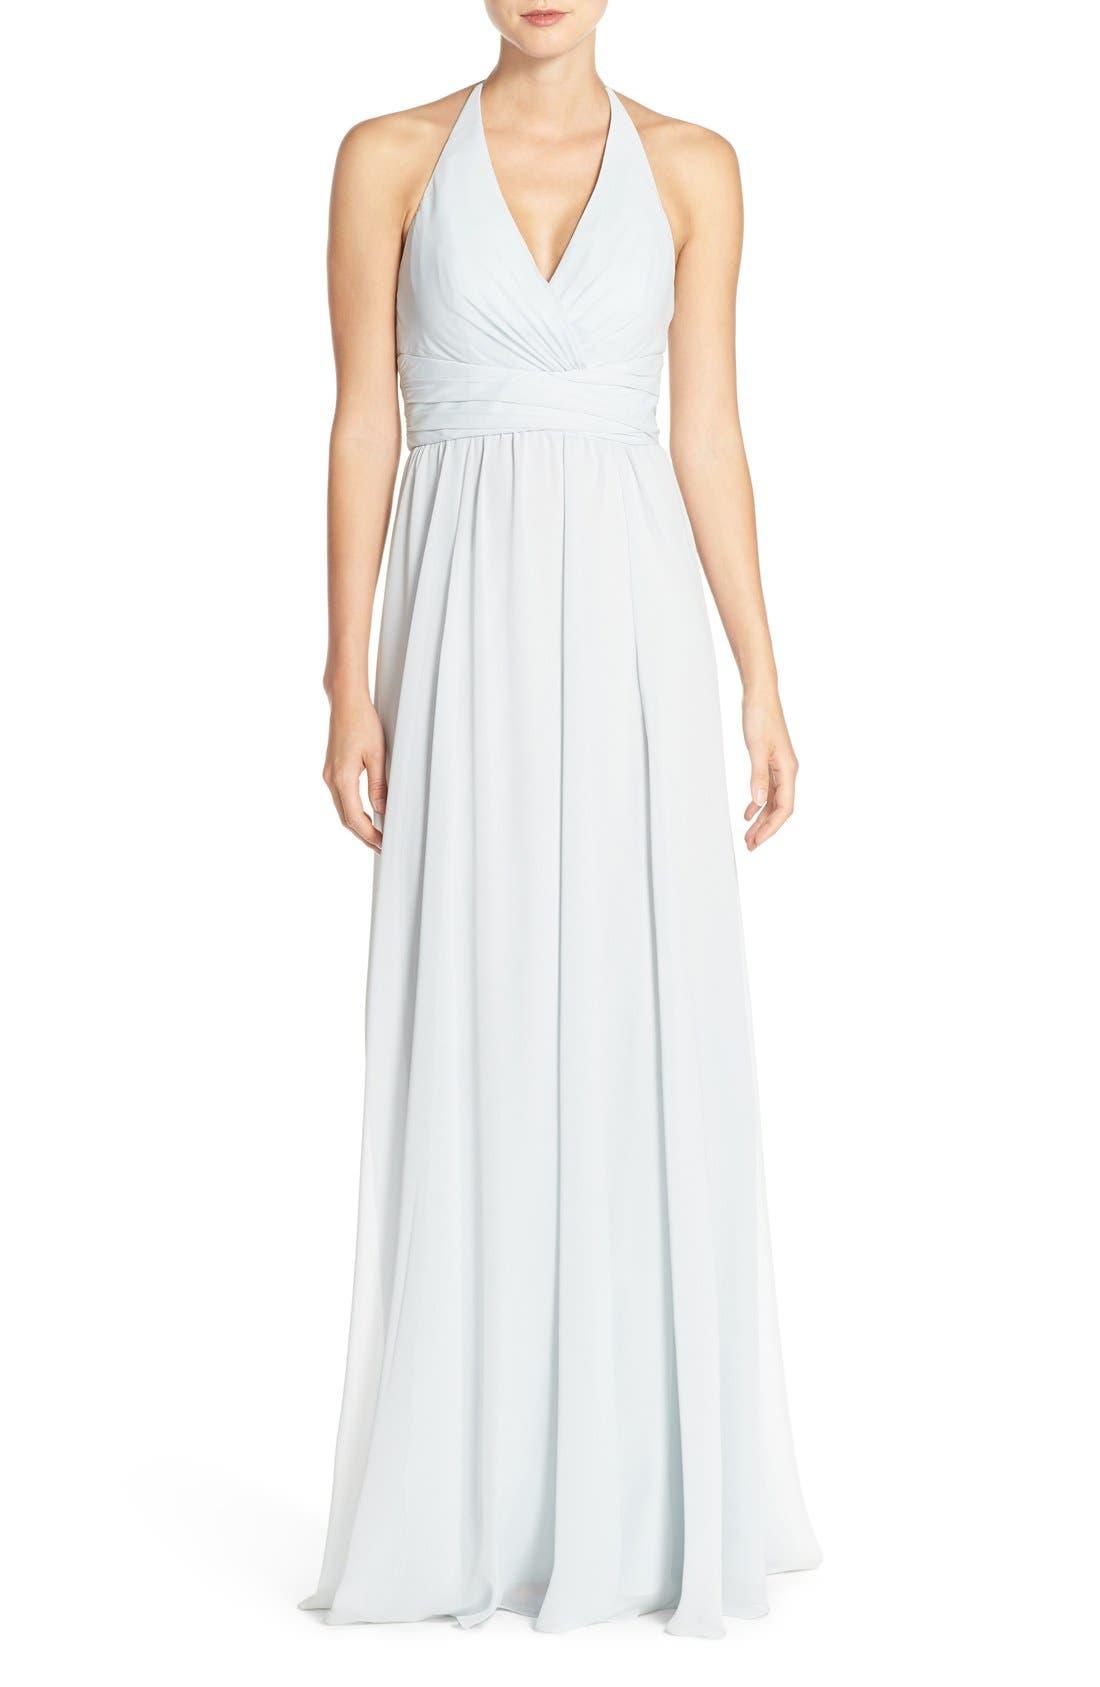 Amsale 'Jennifer' V-Neck Chiffon Halter Gown